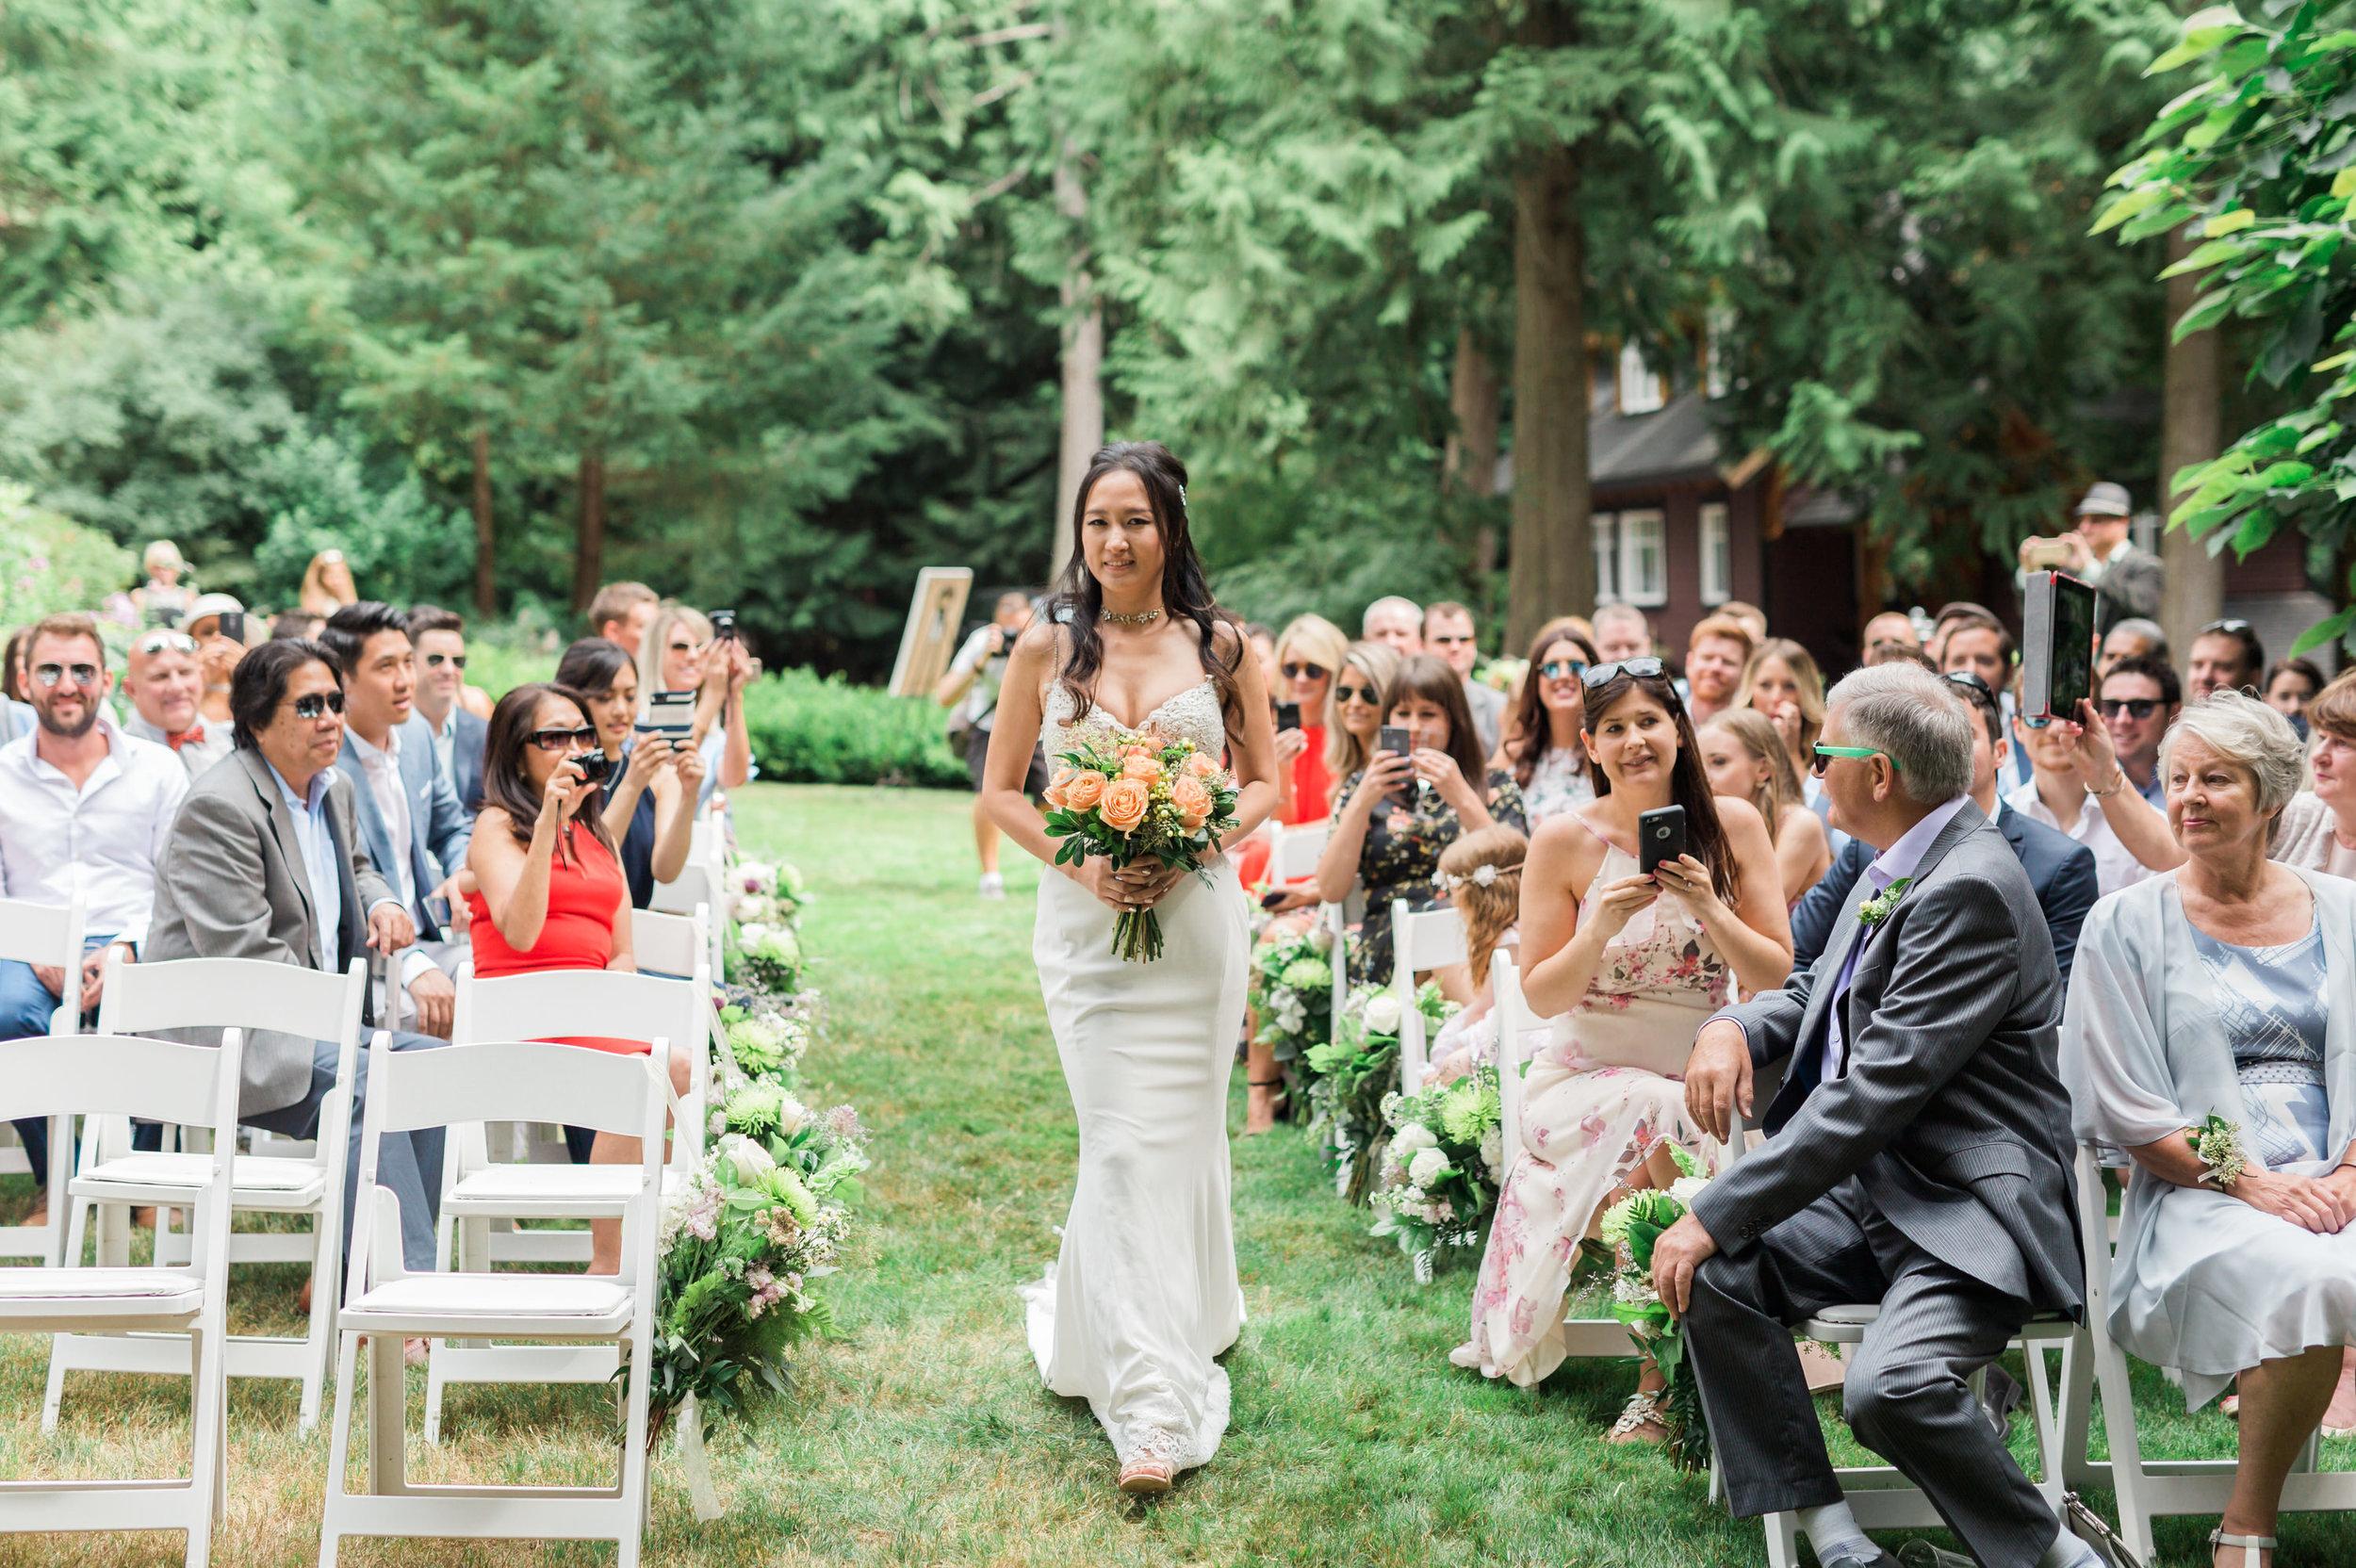 Linwood House Wedding Photos - Roberts Creek Wedding Photos - Vancouver Wedding Photographer & Videographer - Sunshine Coast Wedding Photos - Sunshine Coast Wedding Photographer - Jennifer Picard Photography - IMG_6249.jpg